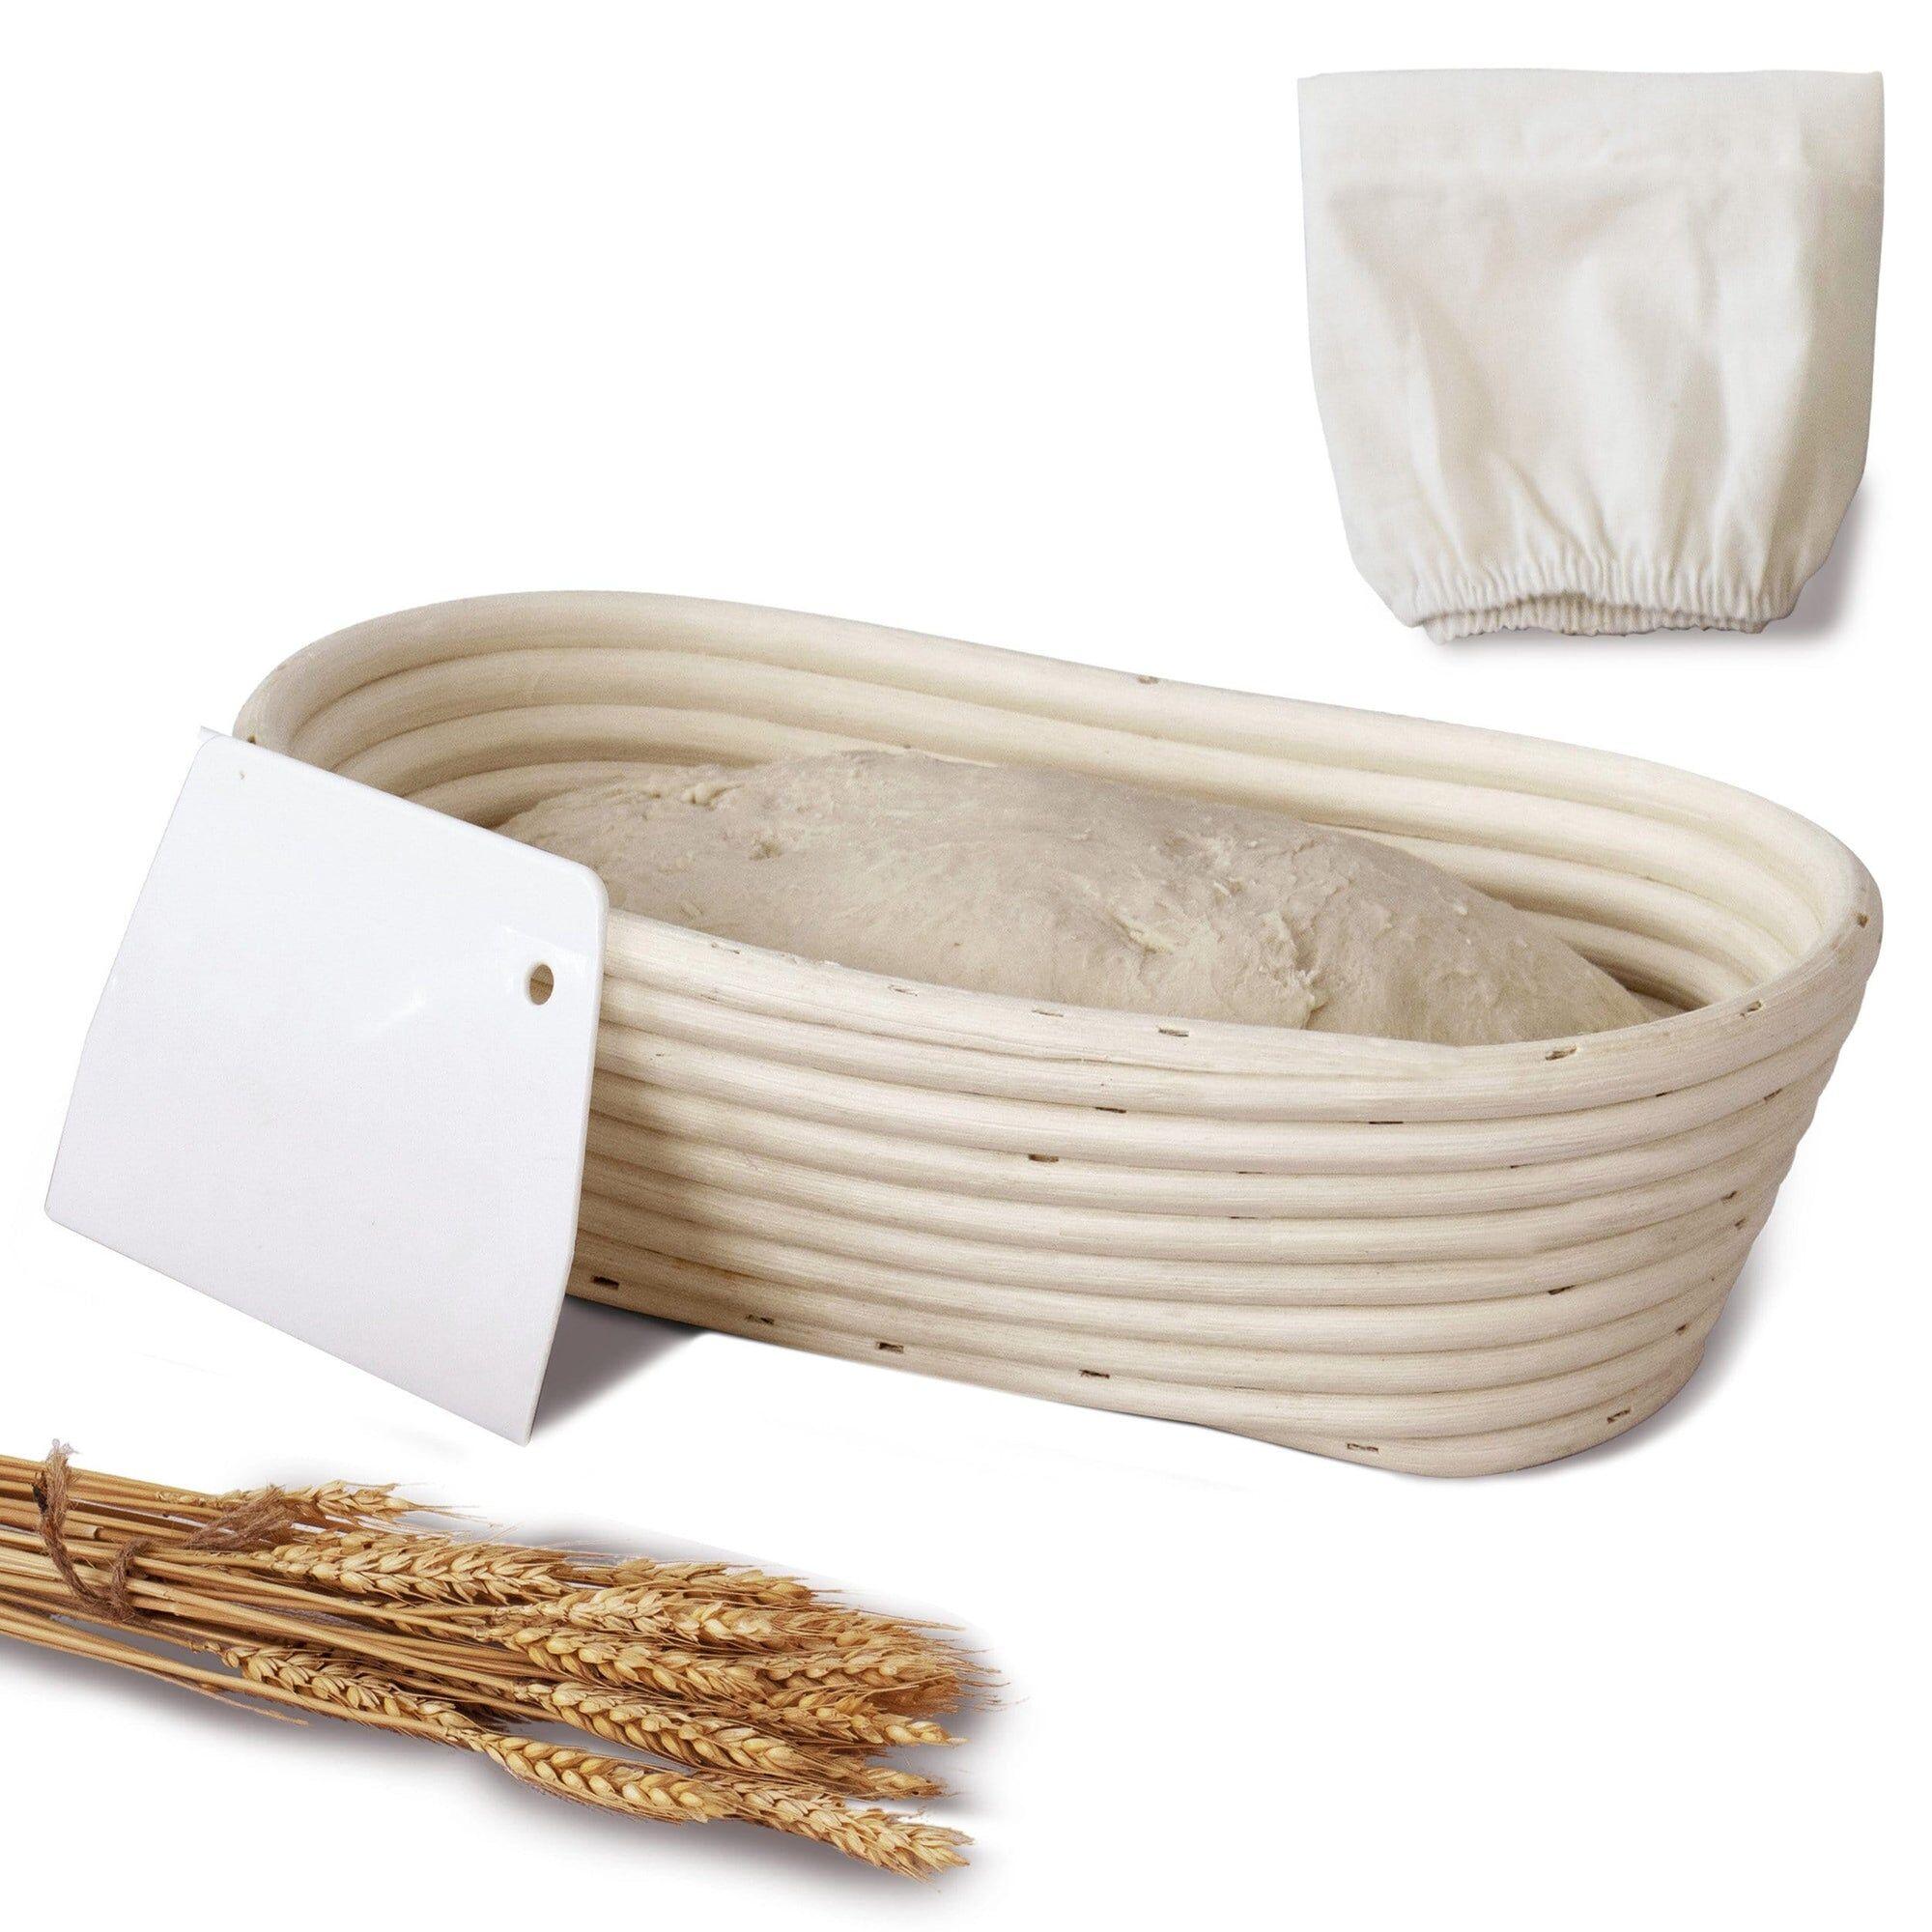 MadeTerra 11-inch Oval Banneton Bread Proofing Basket Set